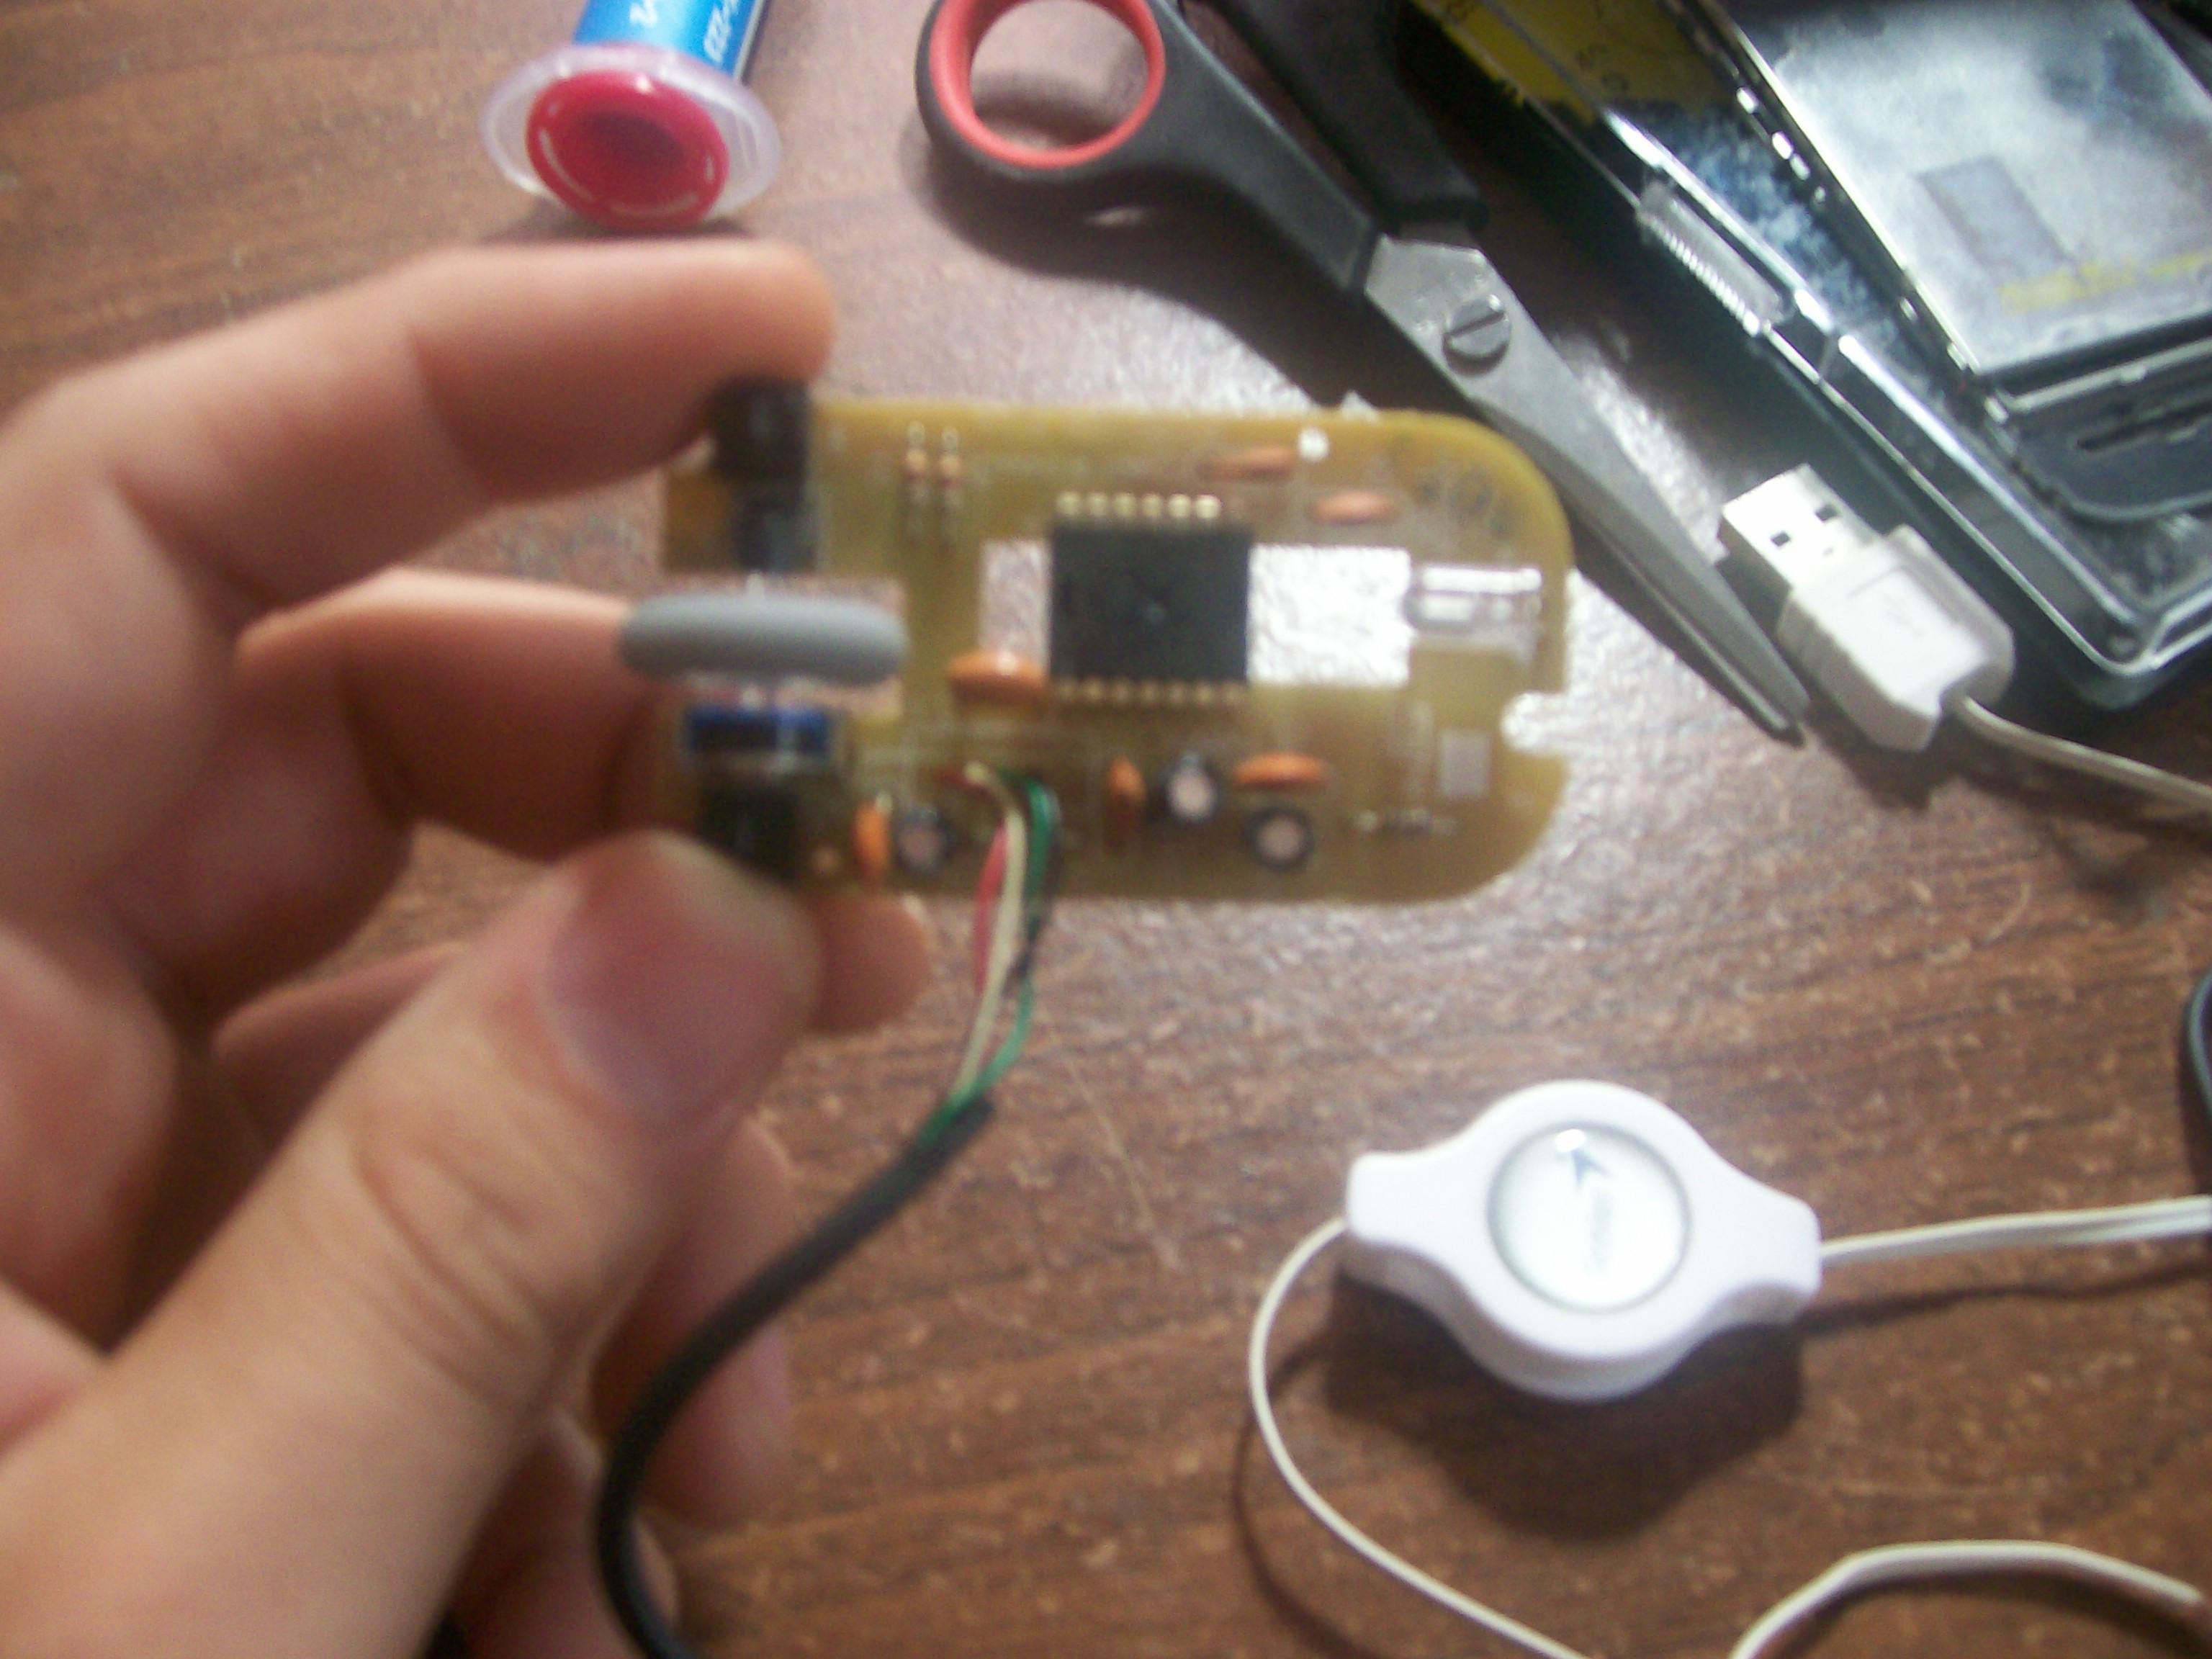 Reparar Mouse (Remplazar A Cable USB)